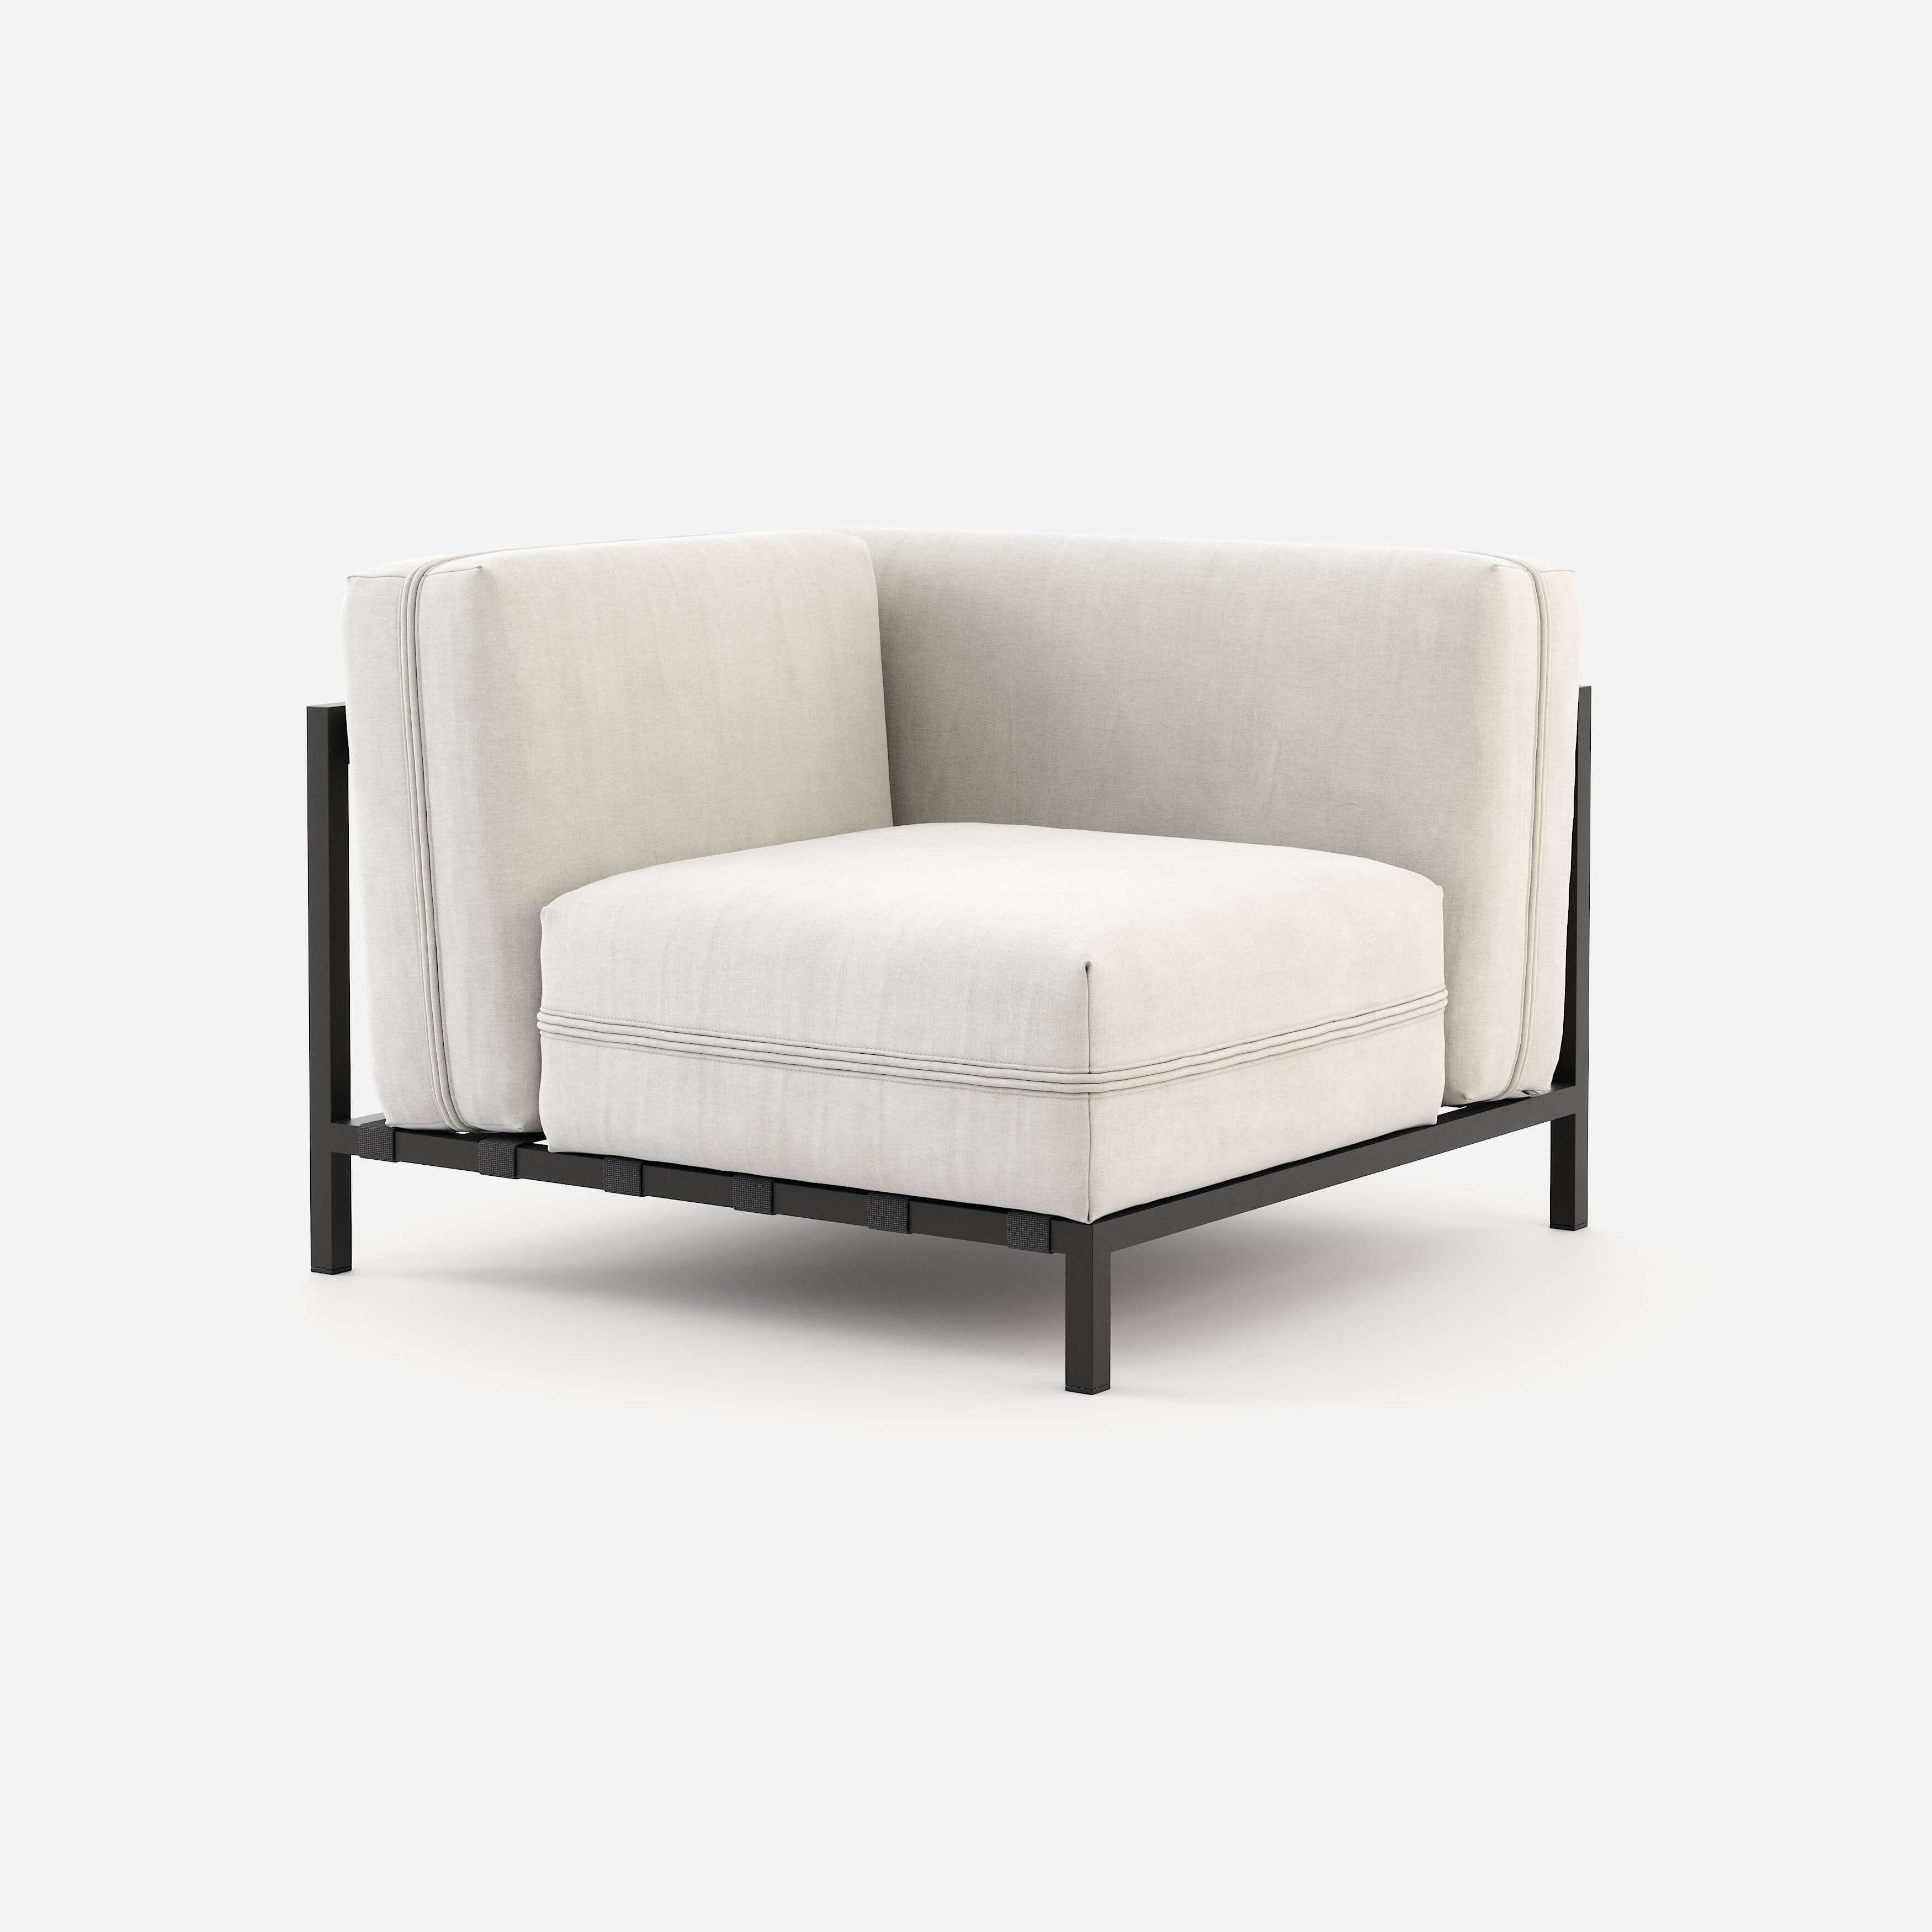 Bondi Corner Sofa-upholstery-domkapa-outdoor-collection-interior-design-home-furniture-home-decor-trends-1